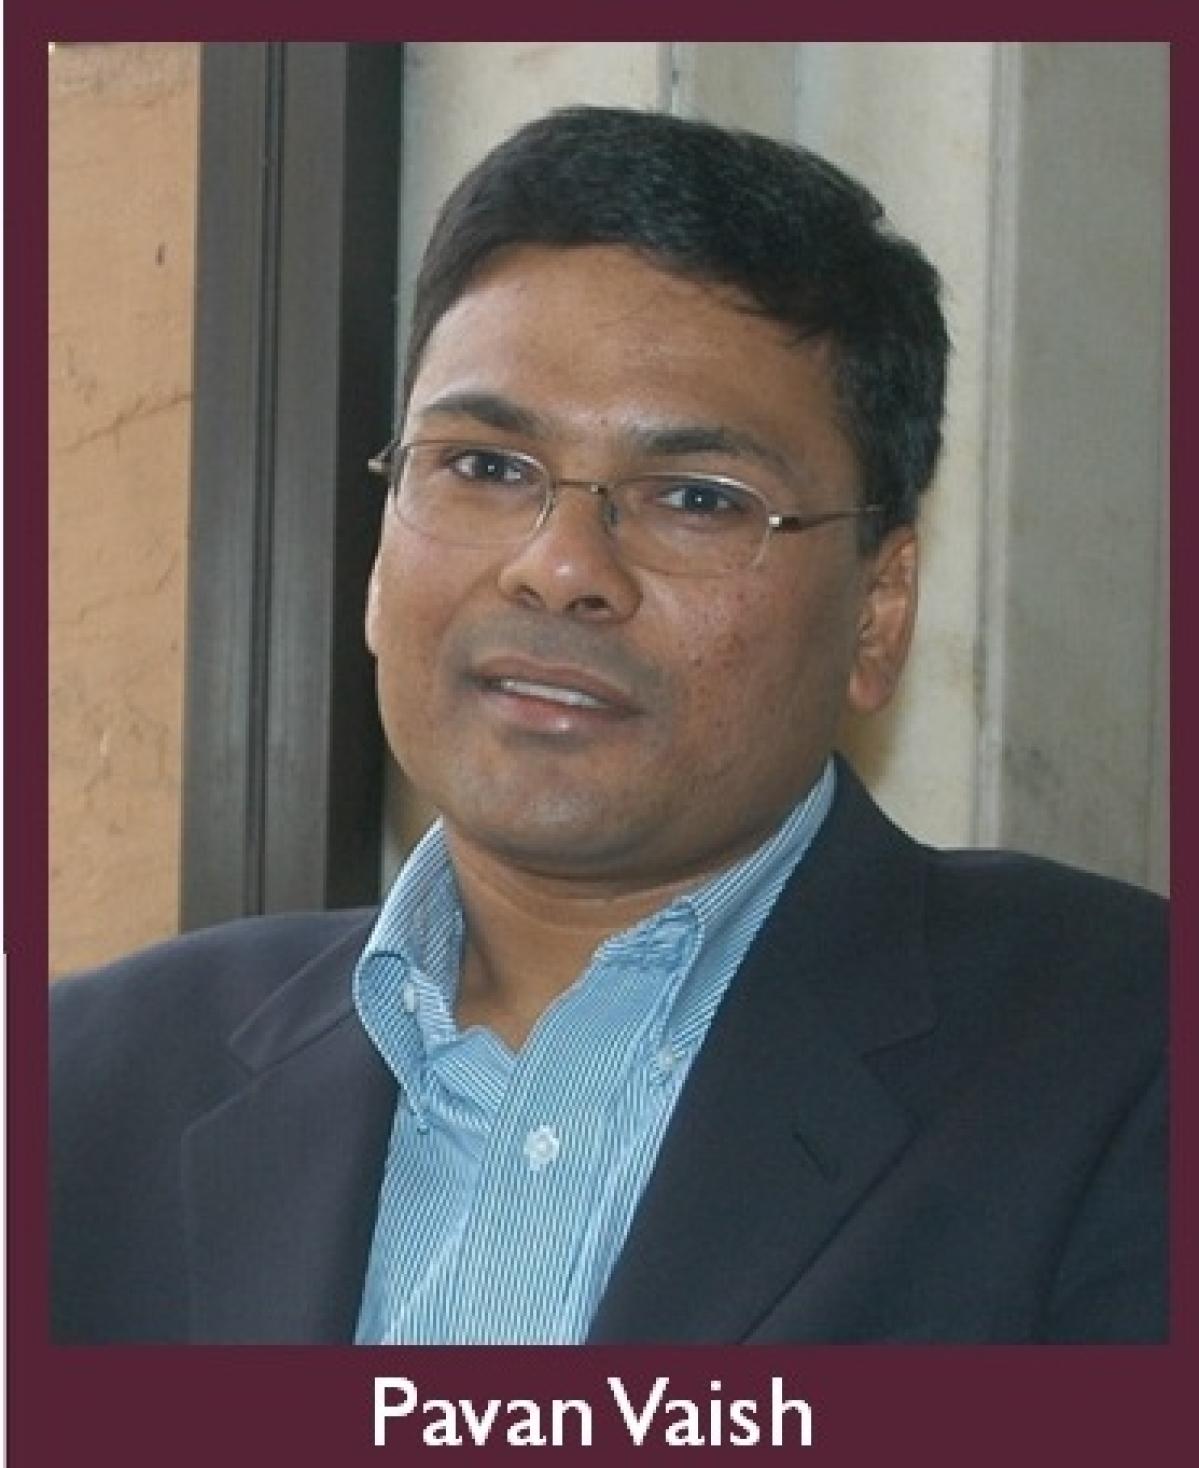 Conversation with Pavan Vaish, Global COO of UnitedLex